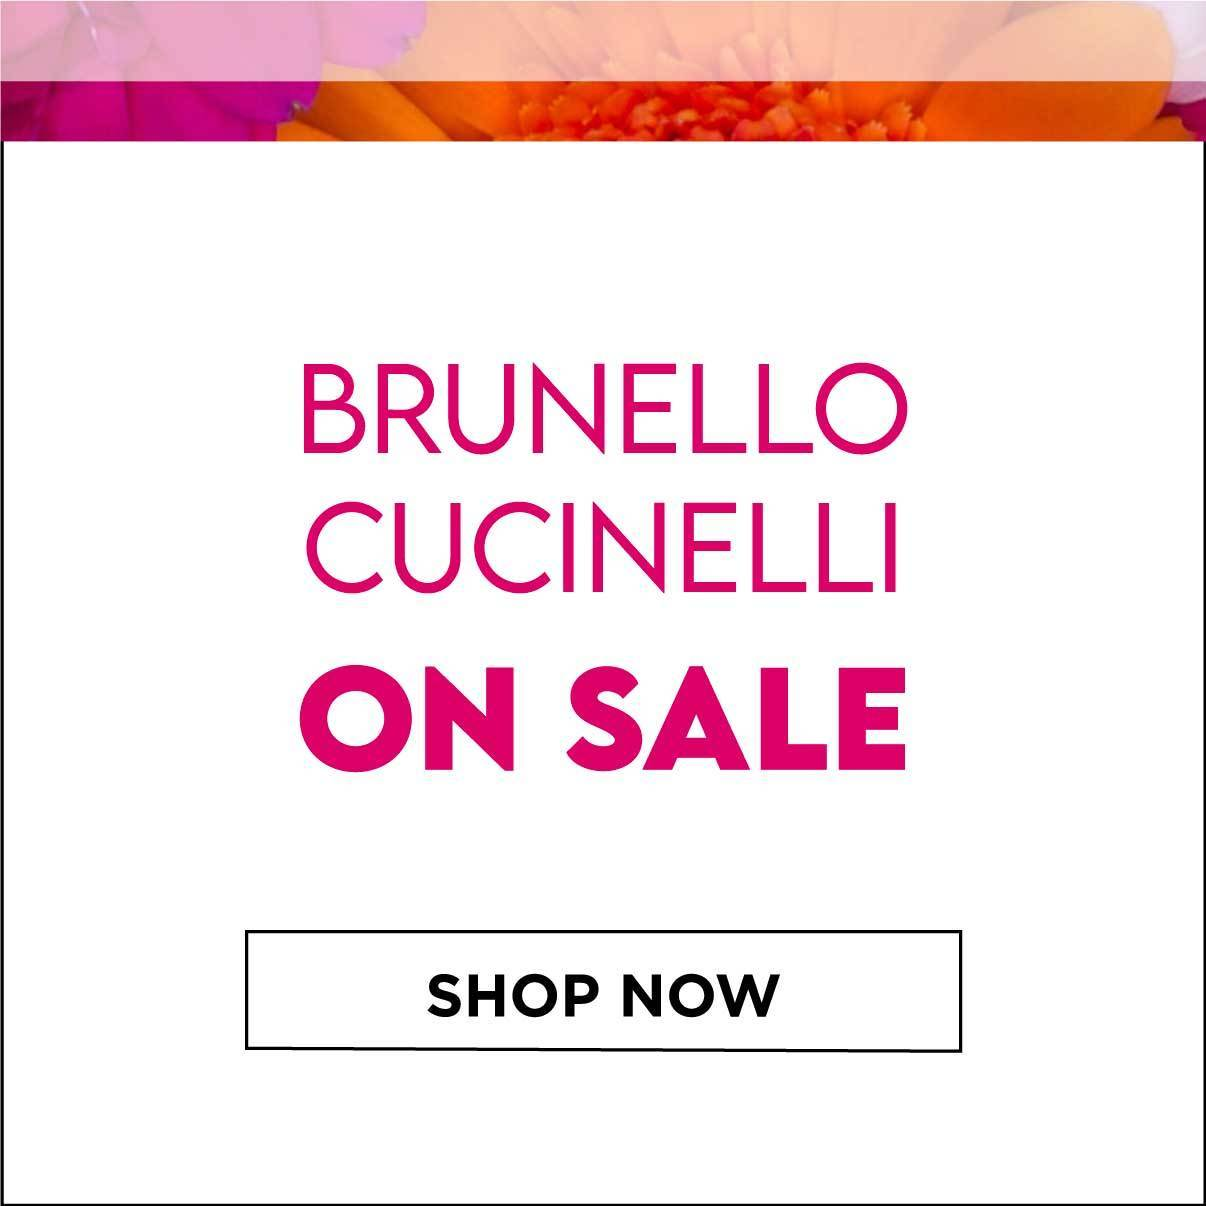 Brunello Cucinelli on sale